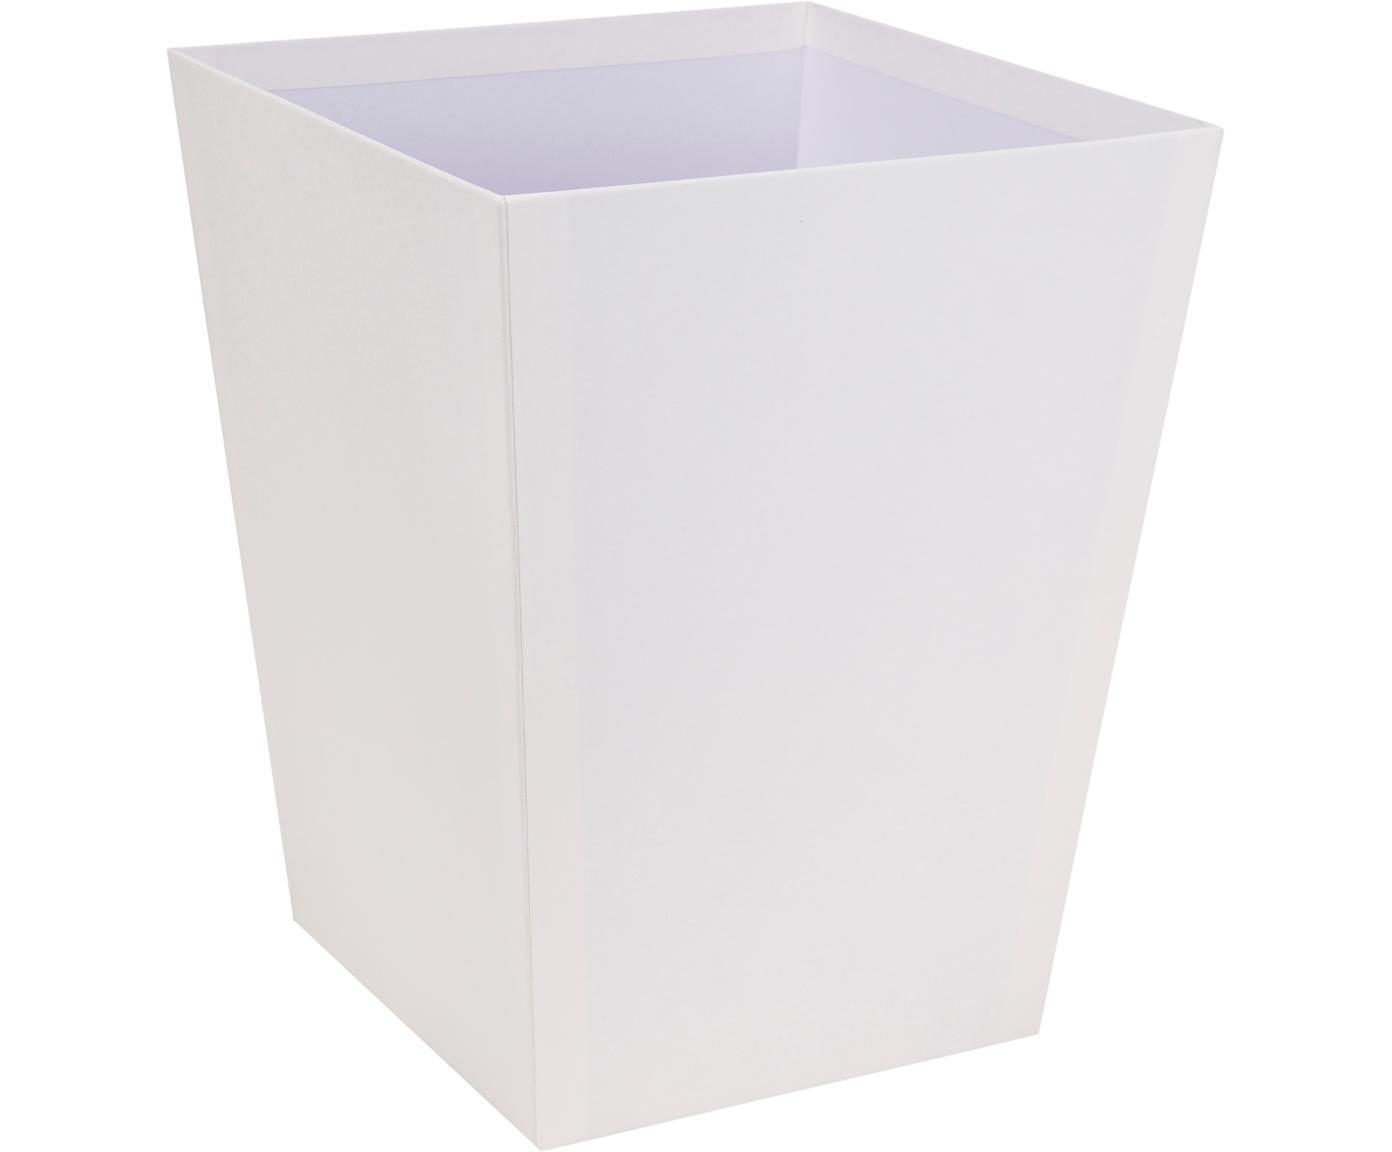 Papierkorb Sofia, Fester, laminierter Karton, Weiß, 26 x 33 cm